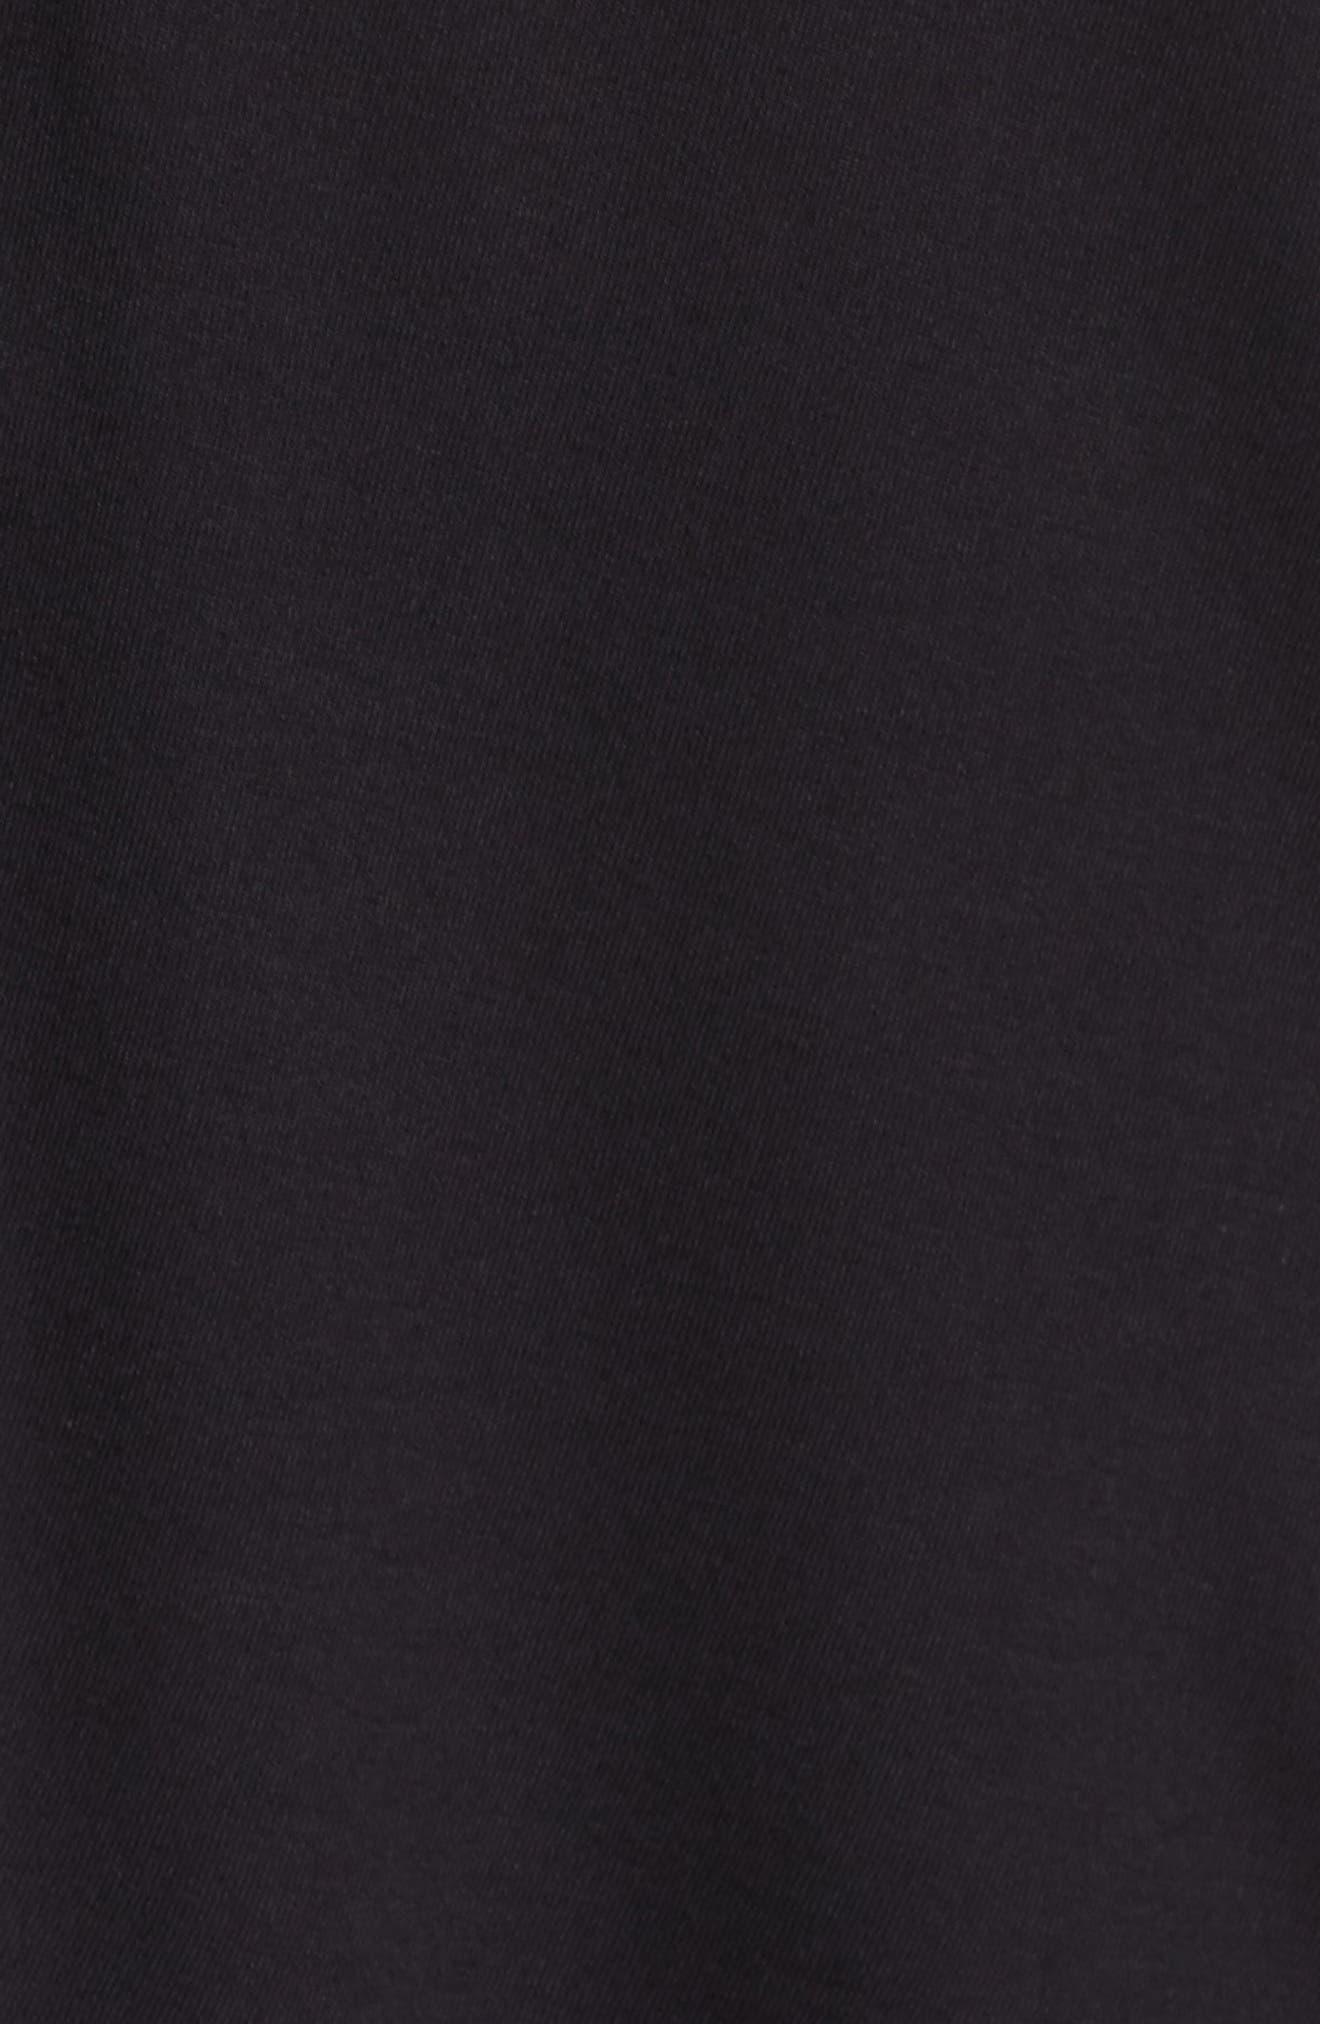 Lace Trim Ruffle Tee,                             Alternate thumbnail 5, color,                             001